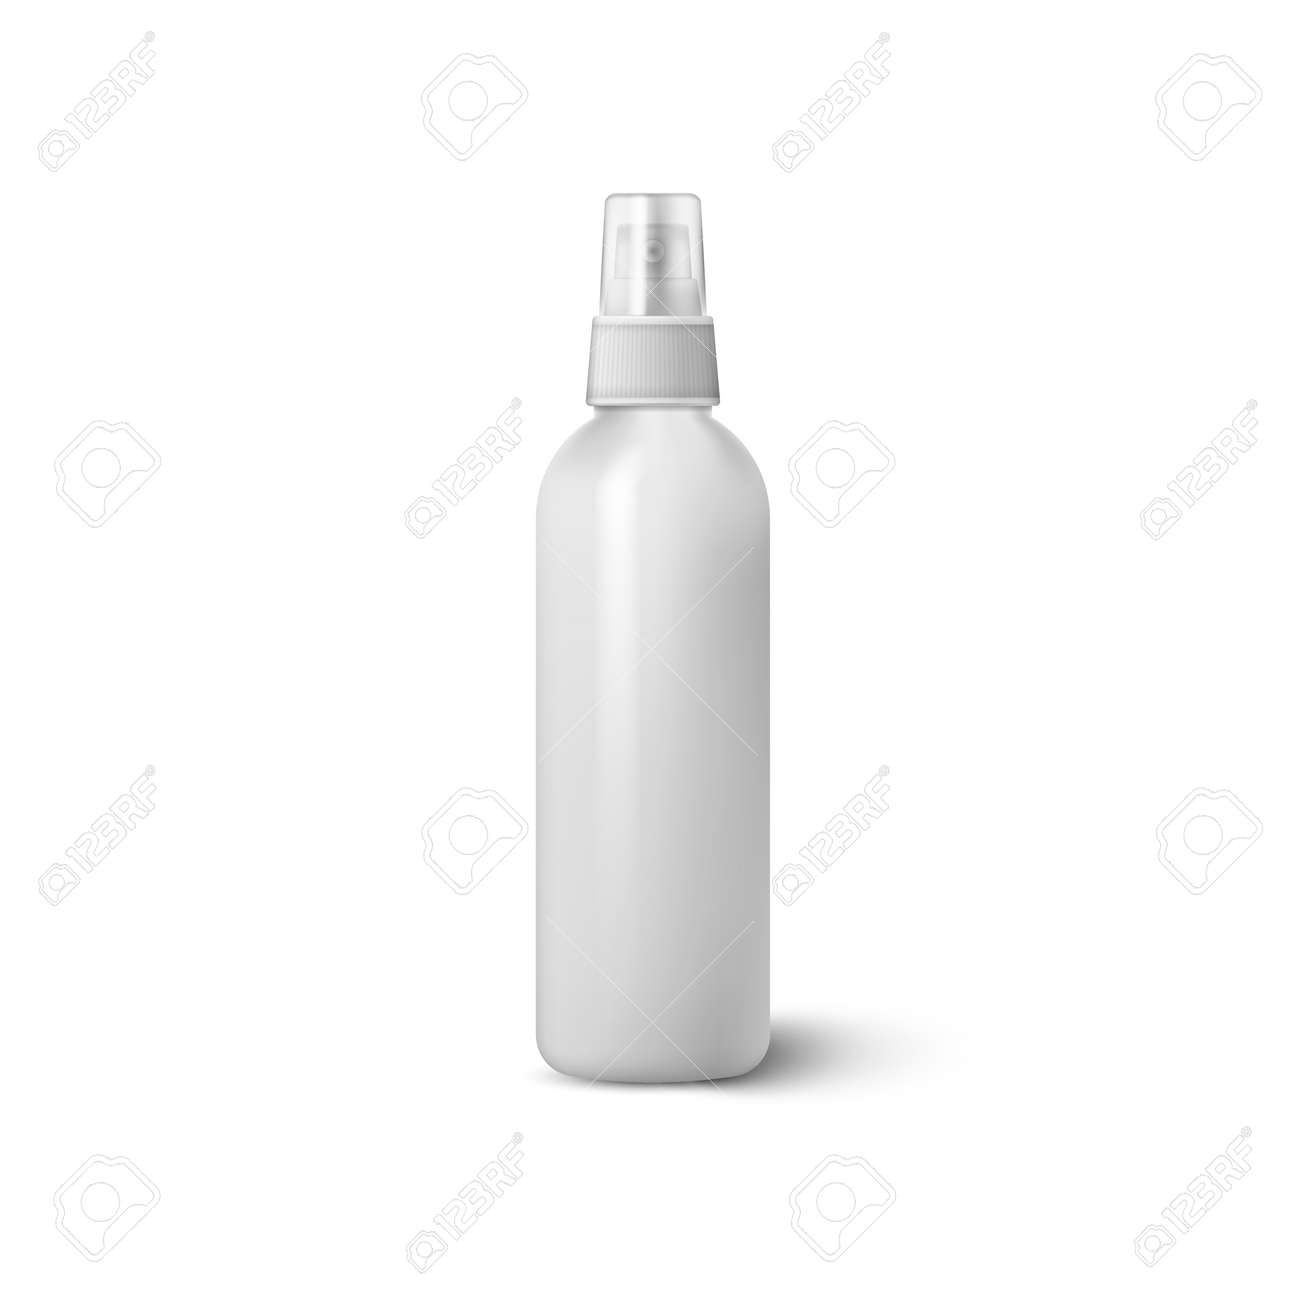 Bottle spray isolated on white background. Vector illustration. - 122614167